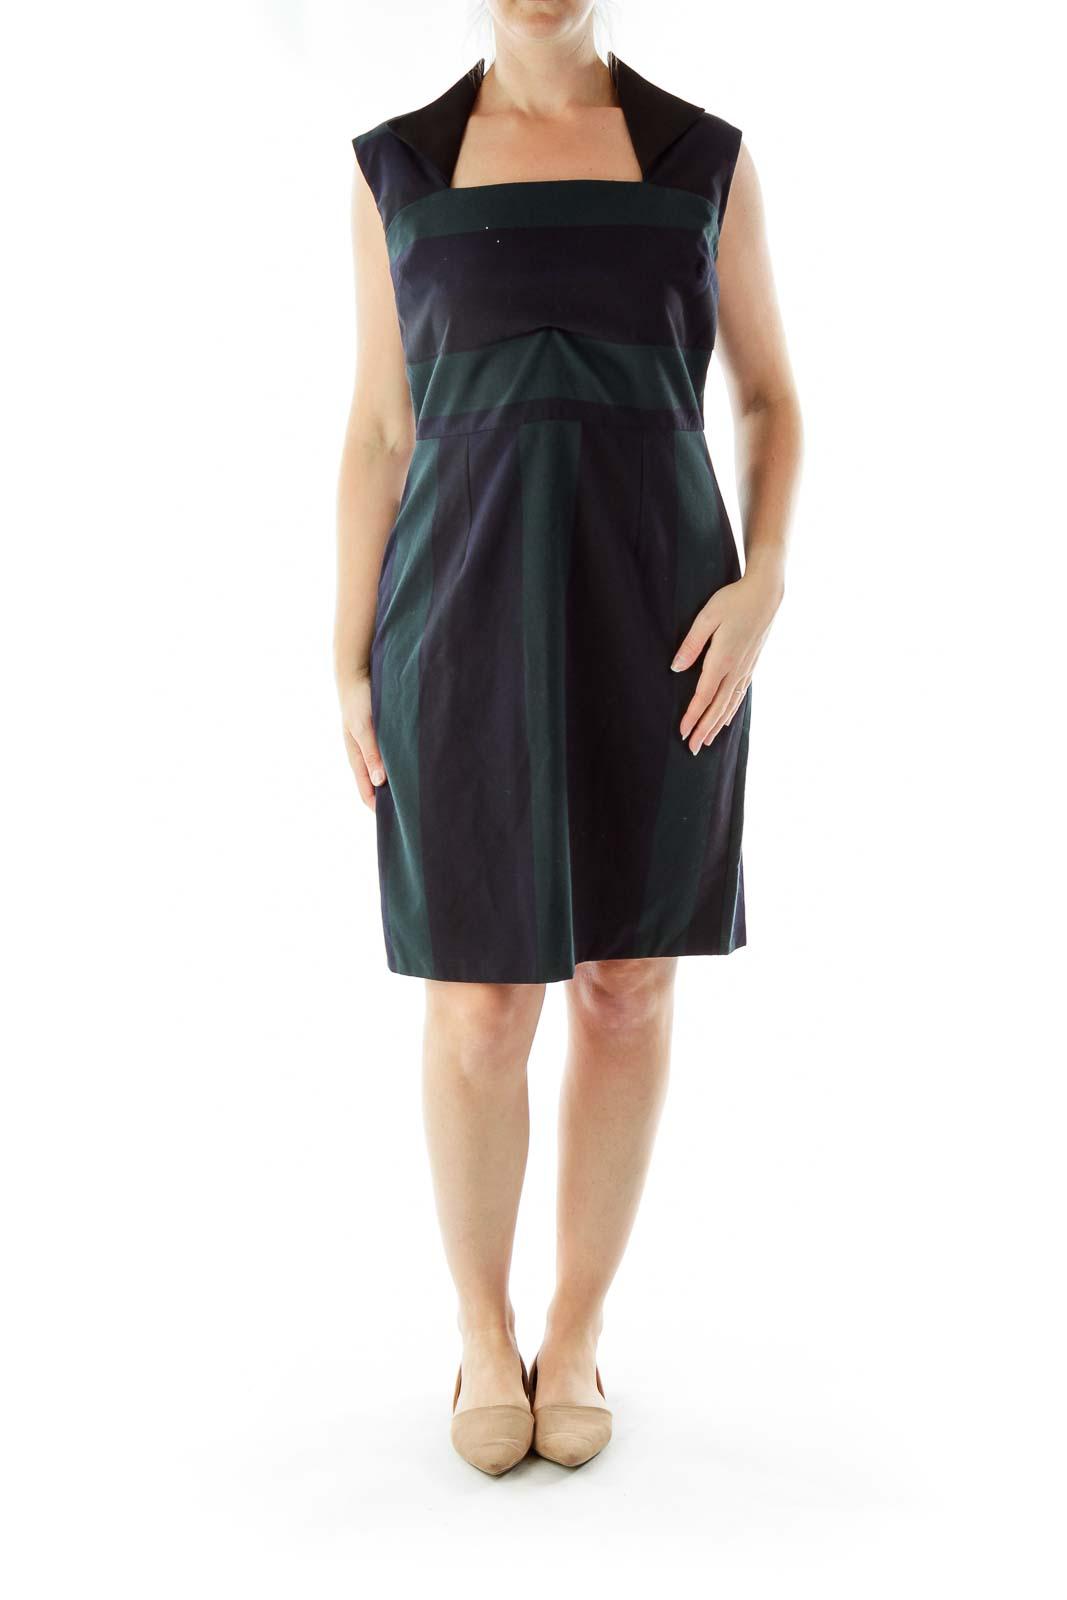 Black Green Square Neck Work Dress